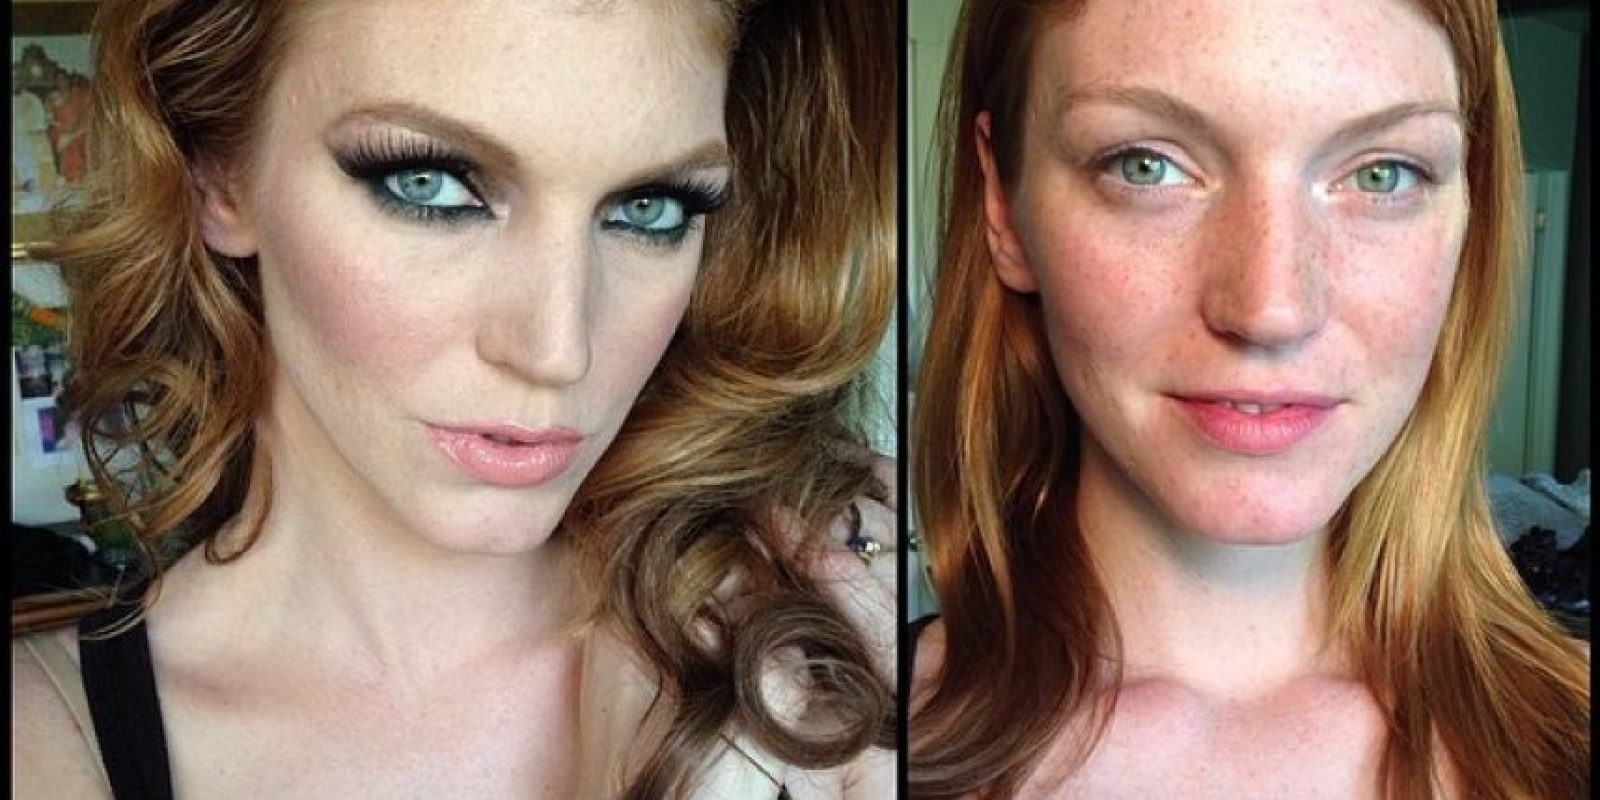 La modelo Jana Rochelle Foto:Instagram (vía @xmelissamakeupx)